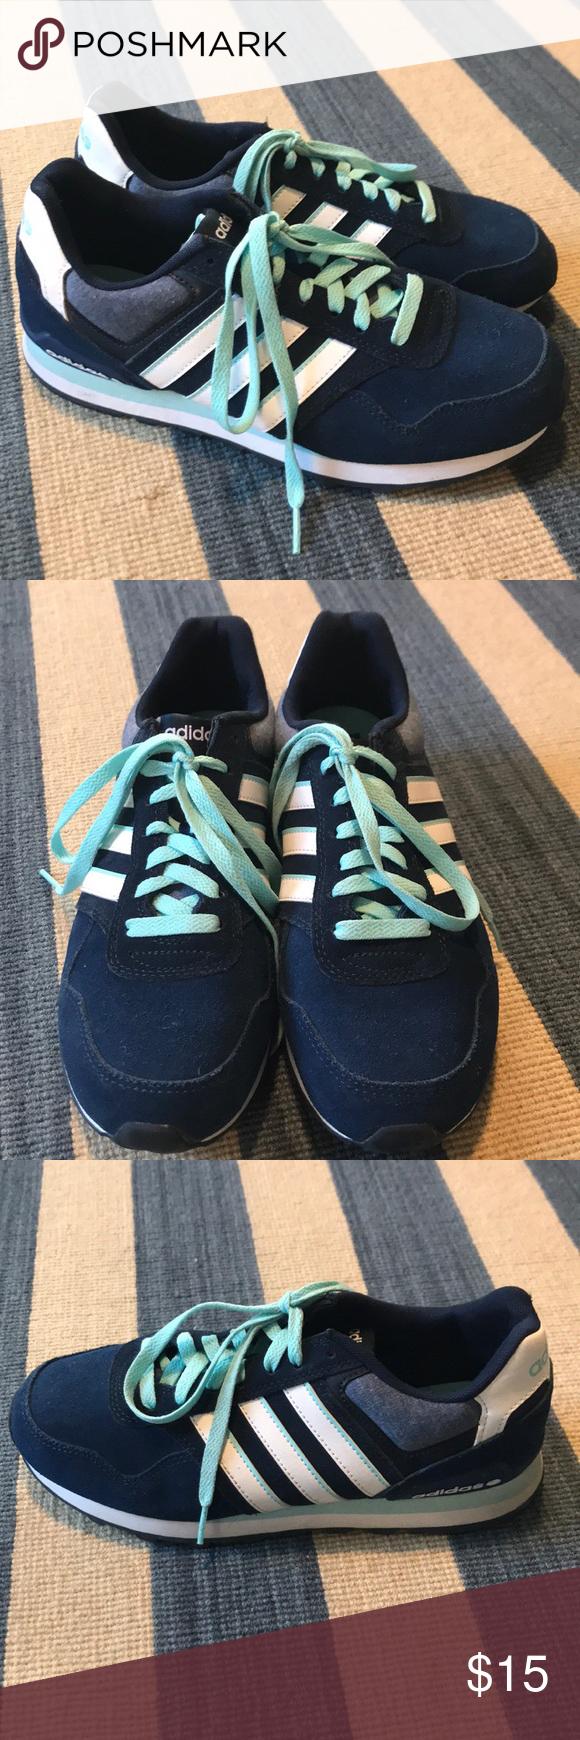 Adidas Neo Label Blue/White Sneakers, Ortholite   Adidas neo label ...